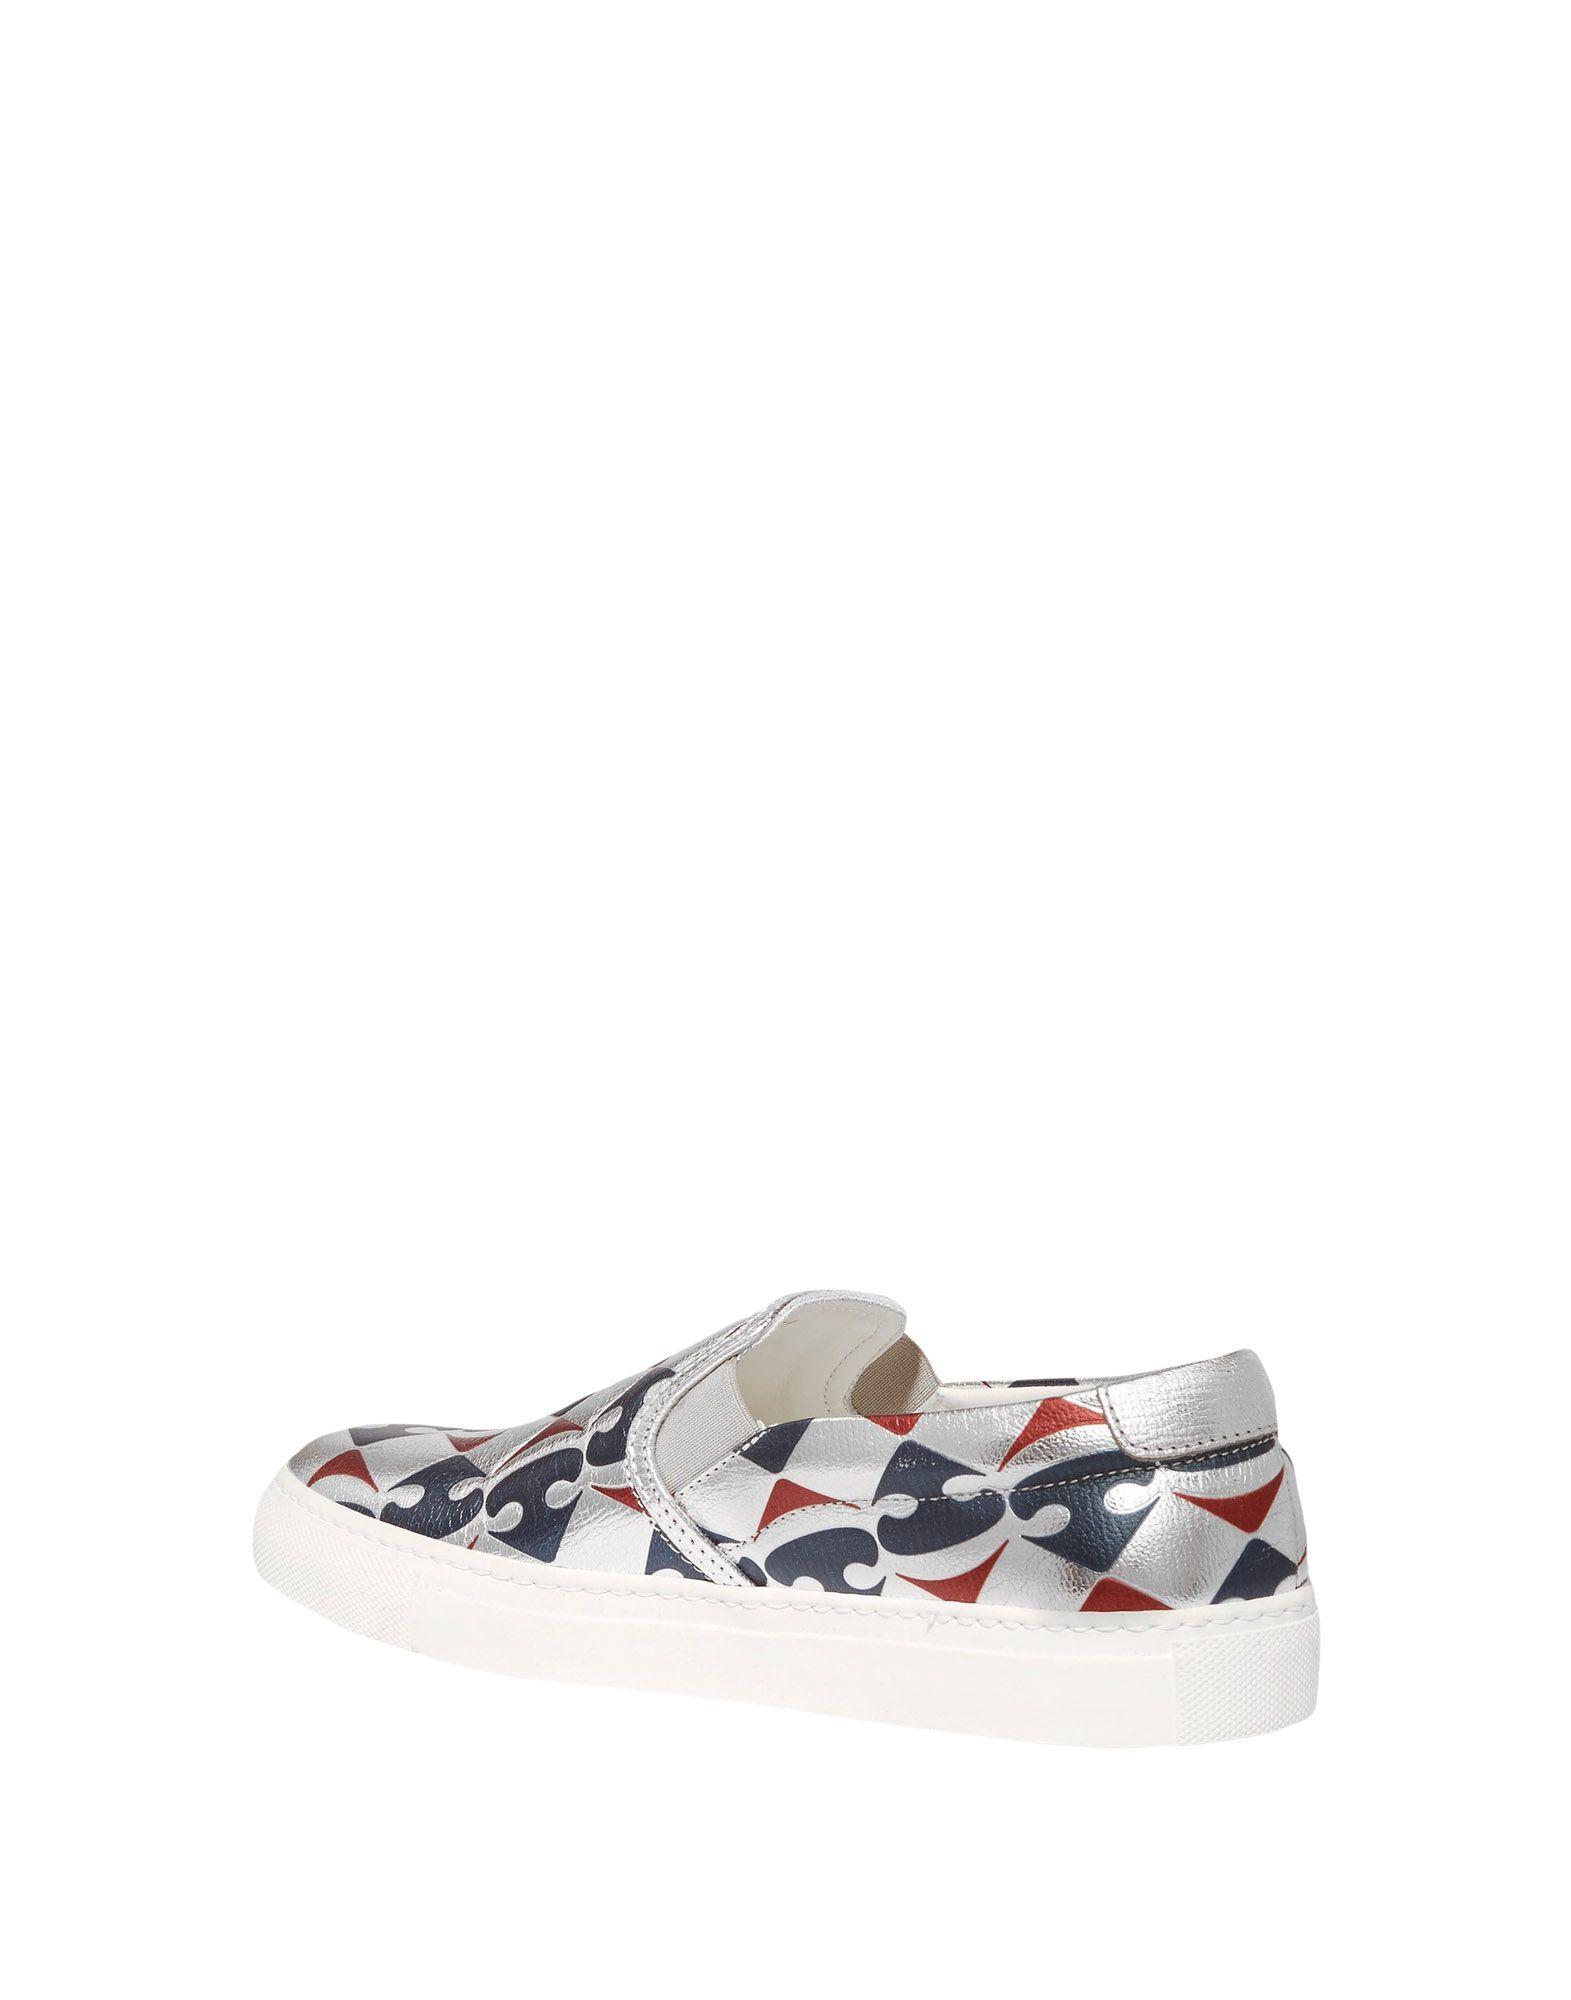 Anya Hindmarch Sneakers Damen  11526330QWGut aussehende strapazierfähige Schuhe